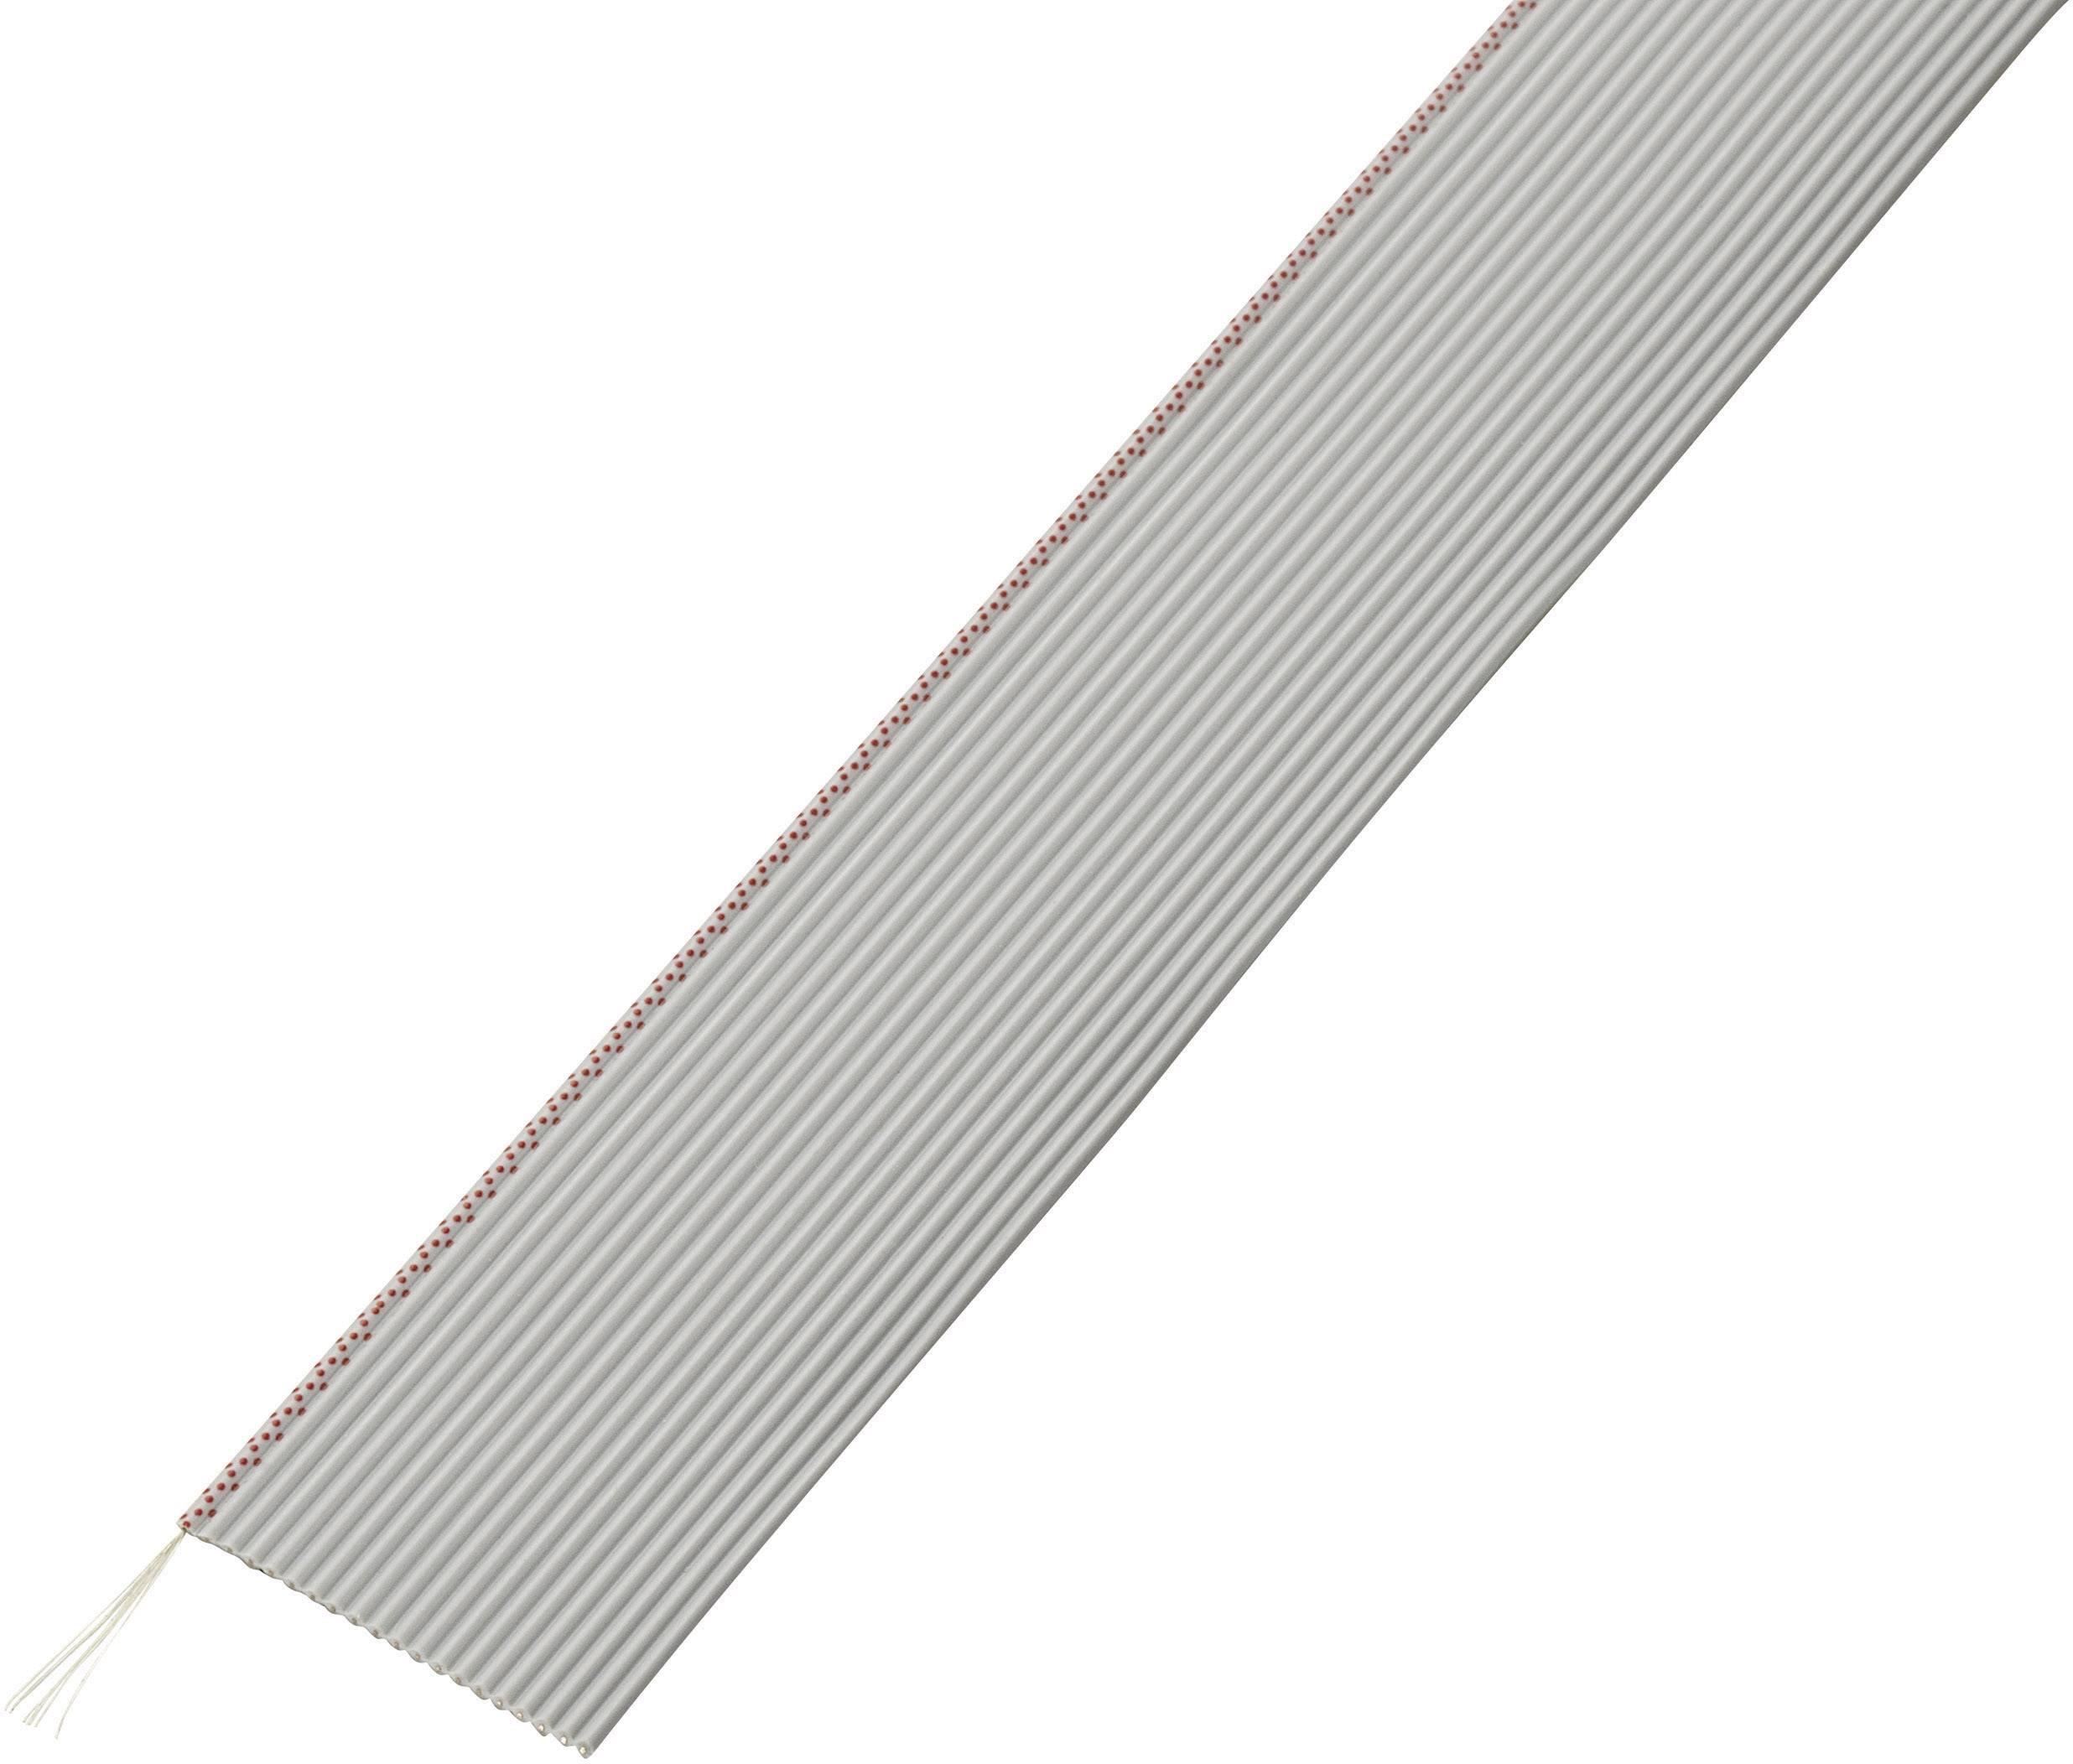 Plochý kabel Flachband cable 20P (SH1998C201), nestíněný, 30.5 m, šedá